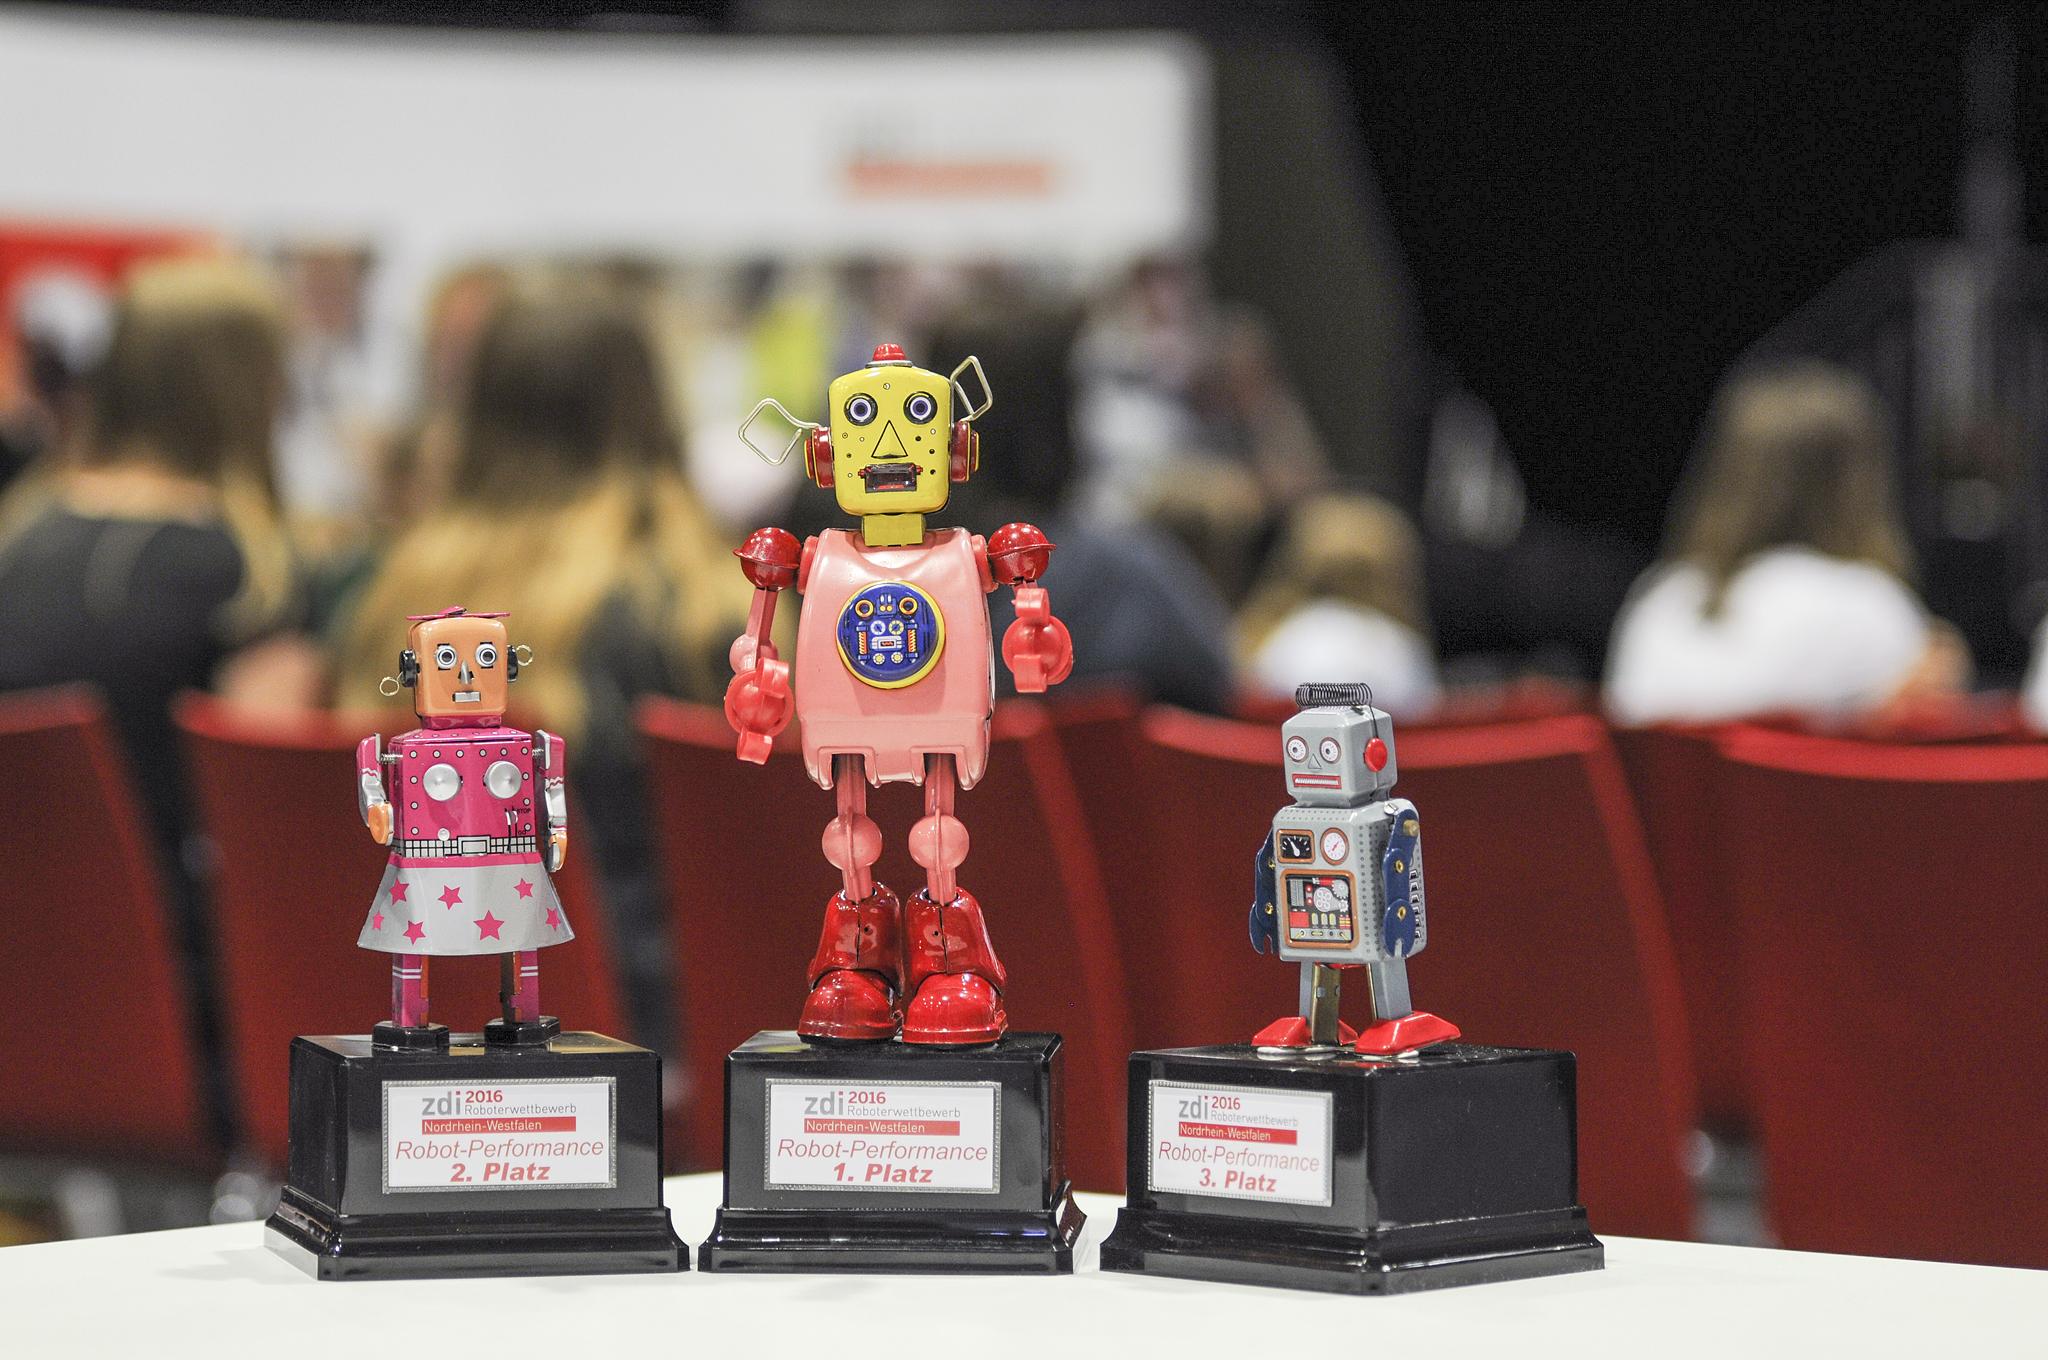 zdi Roboterwettbewerb